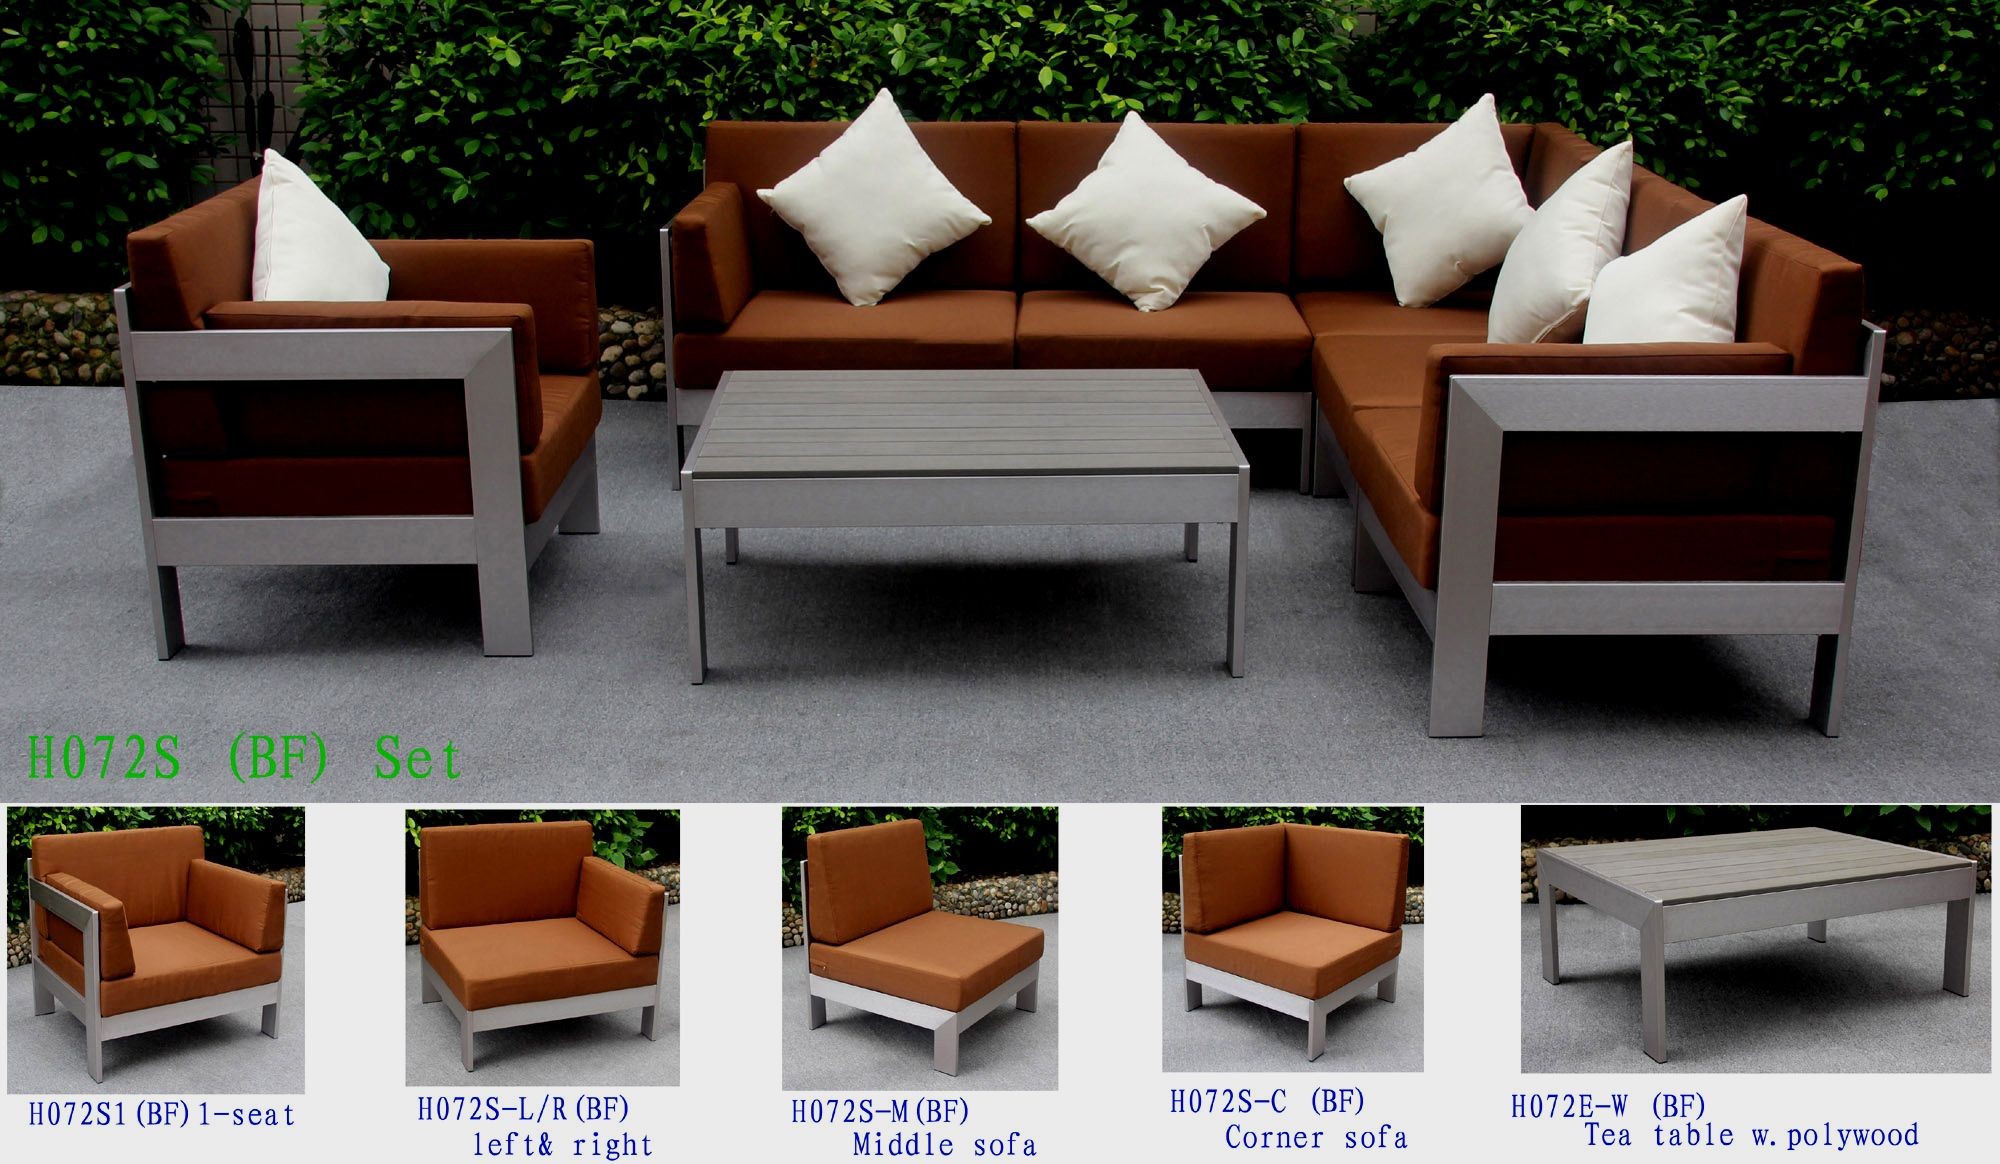 Left Sofa Size 810x700x700 Mm Middle 700x700x700 Corner Single